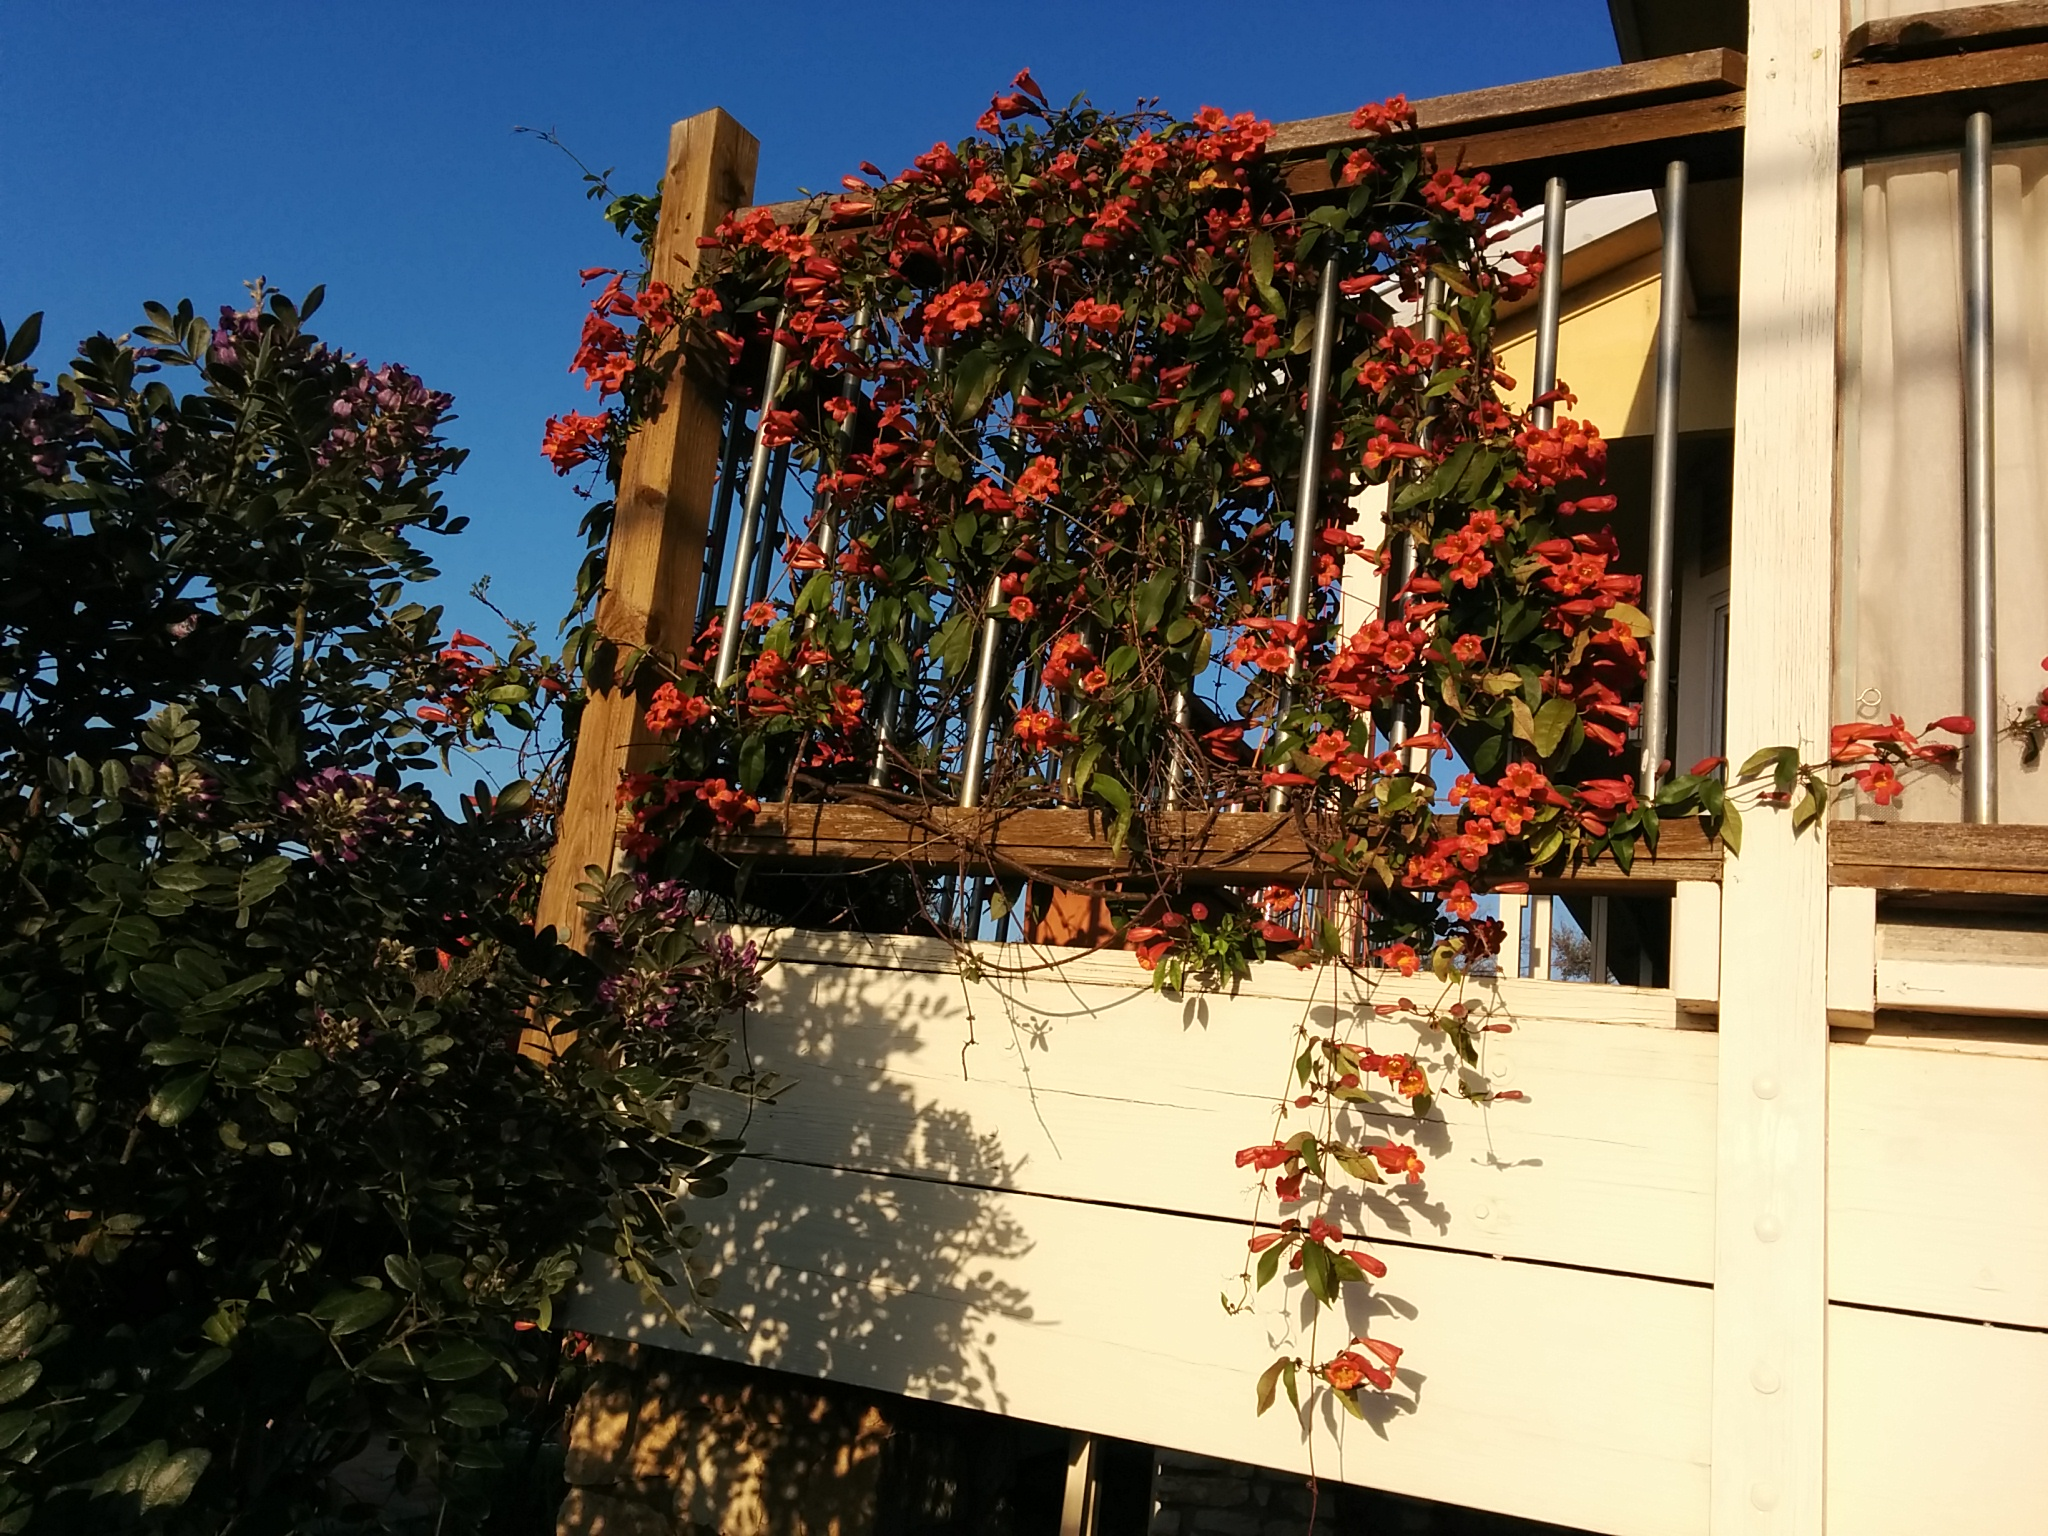 Crossvine in bloom - Bignonia capreolata